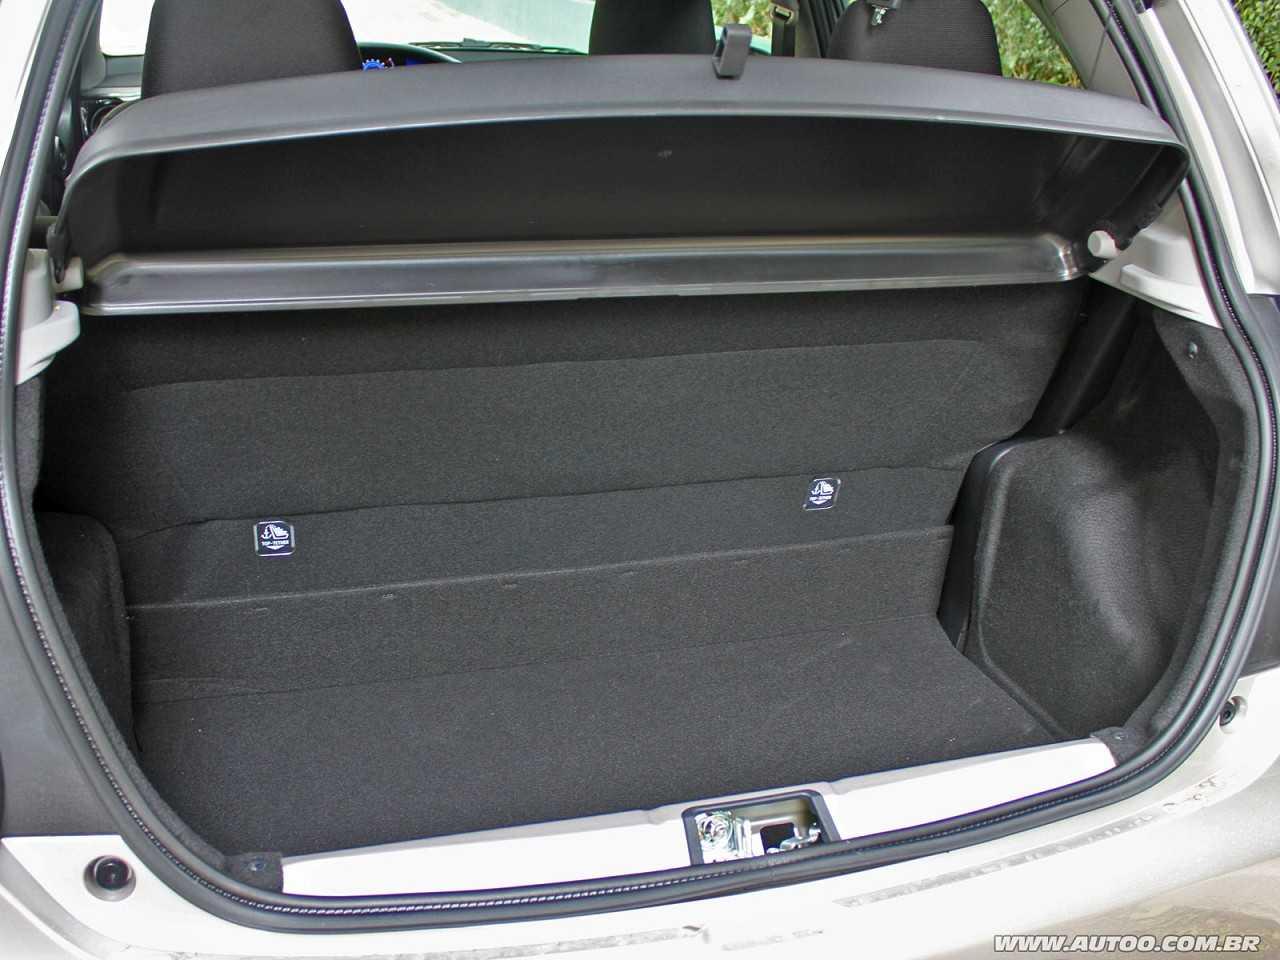 ToyotaEtios 2017 - porta-malas